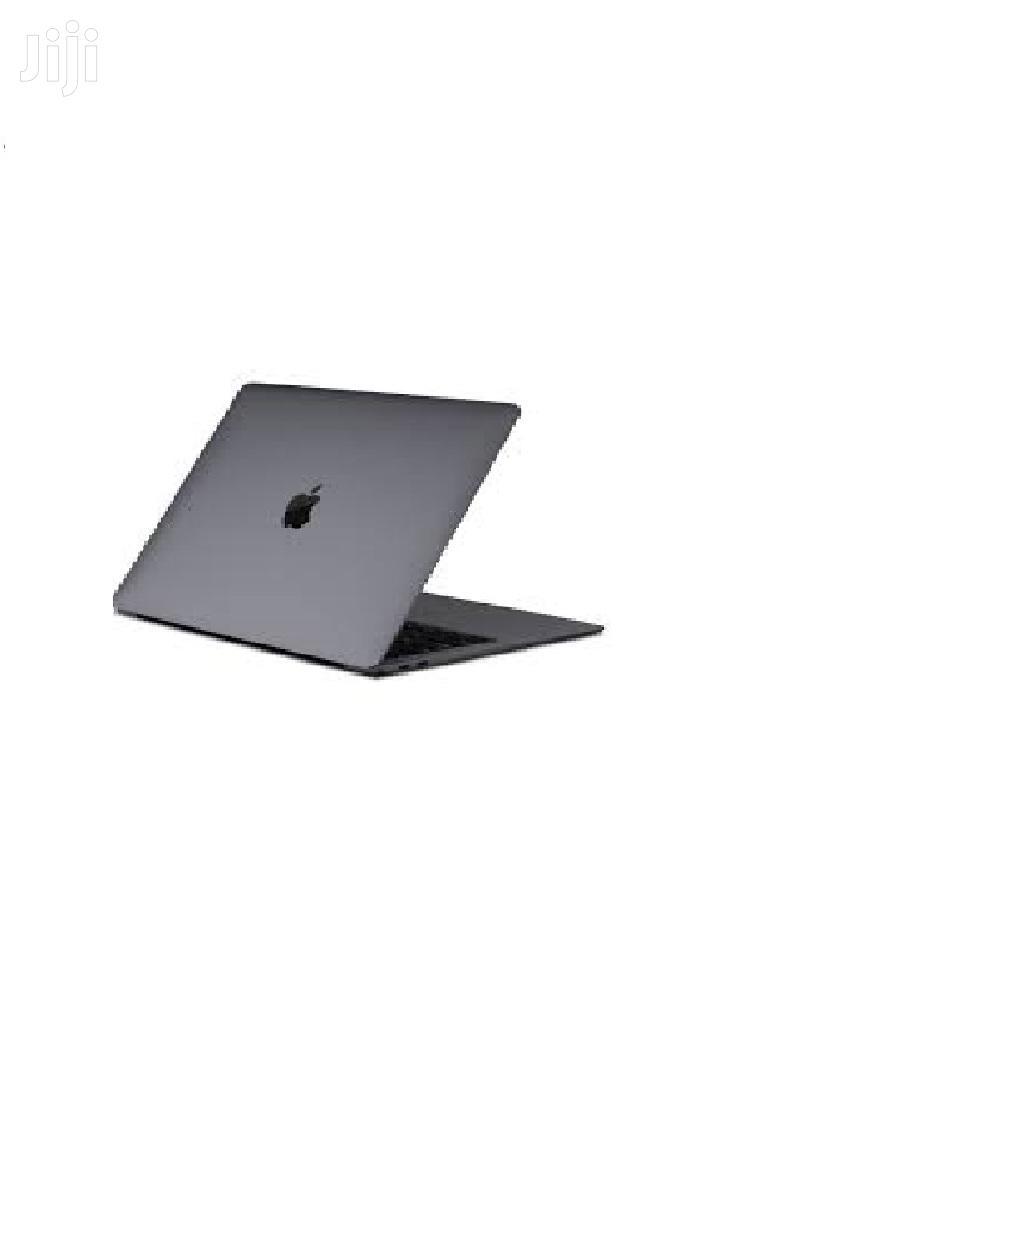 New Laptop Apple MacBook Air 8GB Intel Core I3 SSD 256GB | Laptops & Computers for sale in Tema Metropolitan, Greater Accra, Ghana